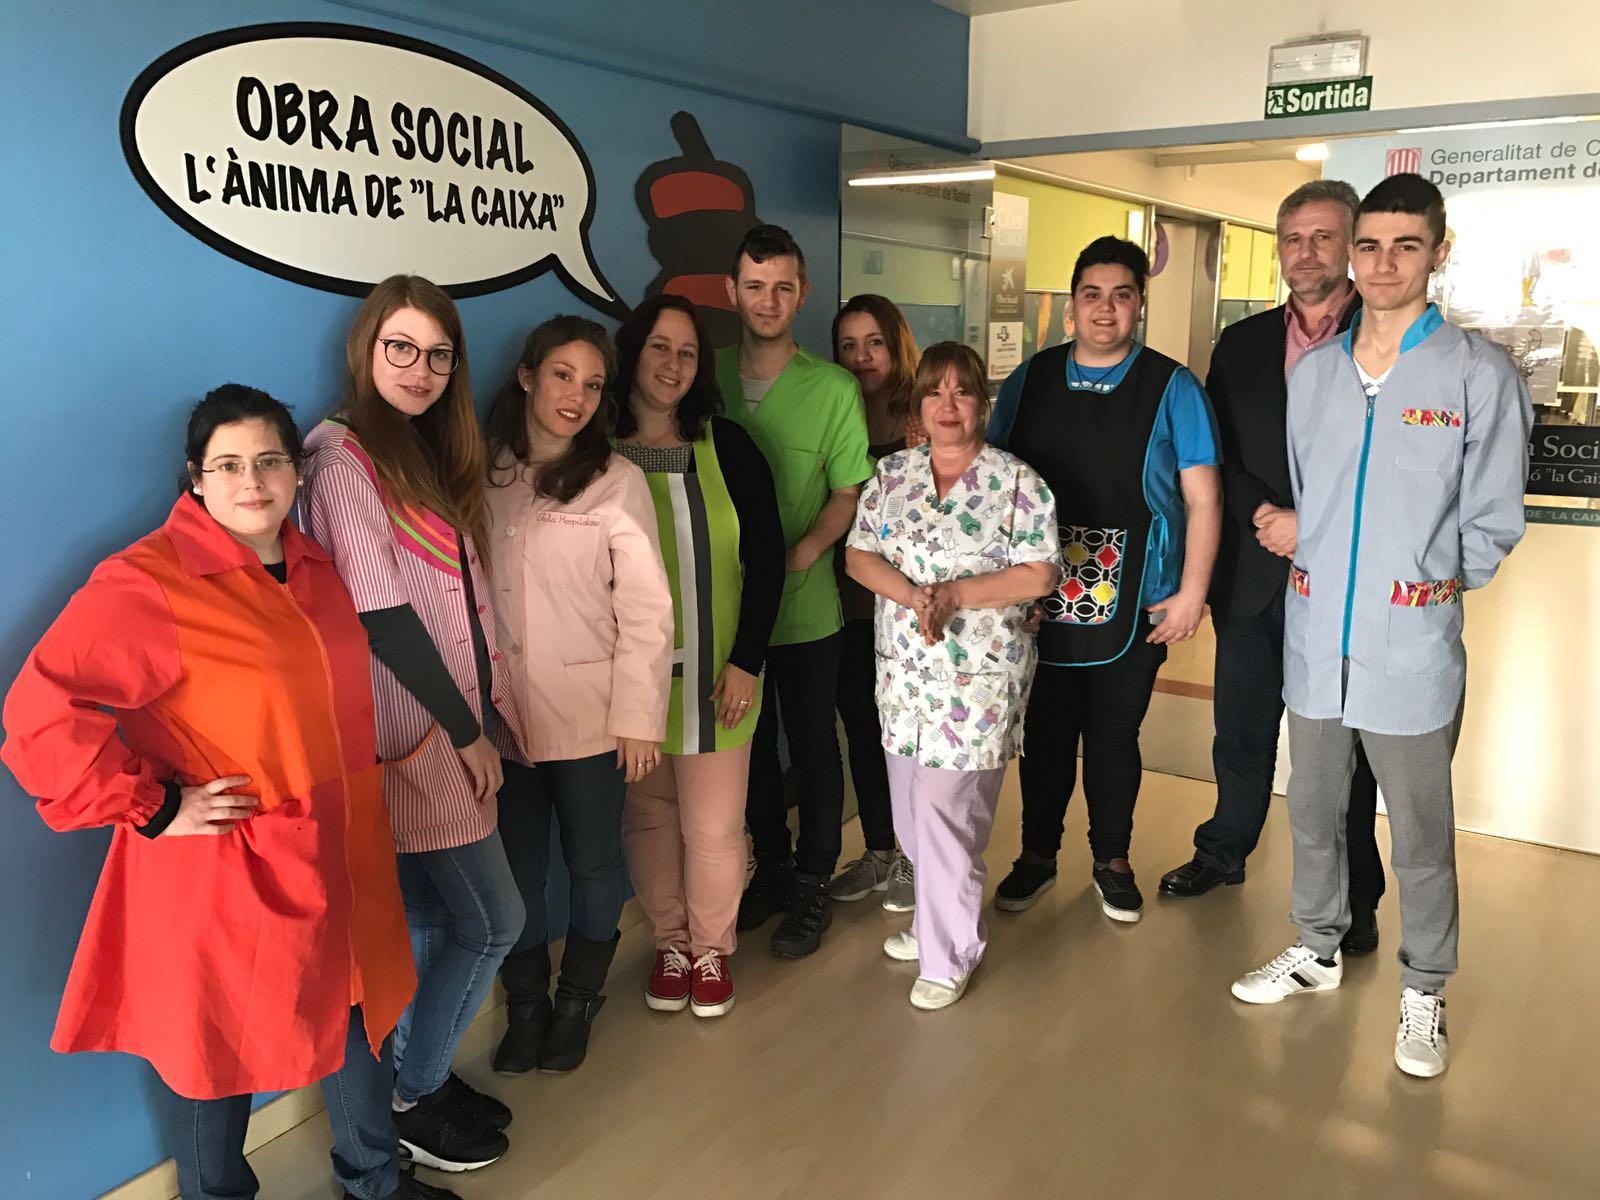 Aula Hospitalaria Dr. Antoni Cambrodi Lleida: febrero 2017